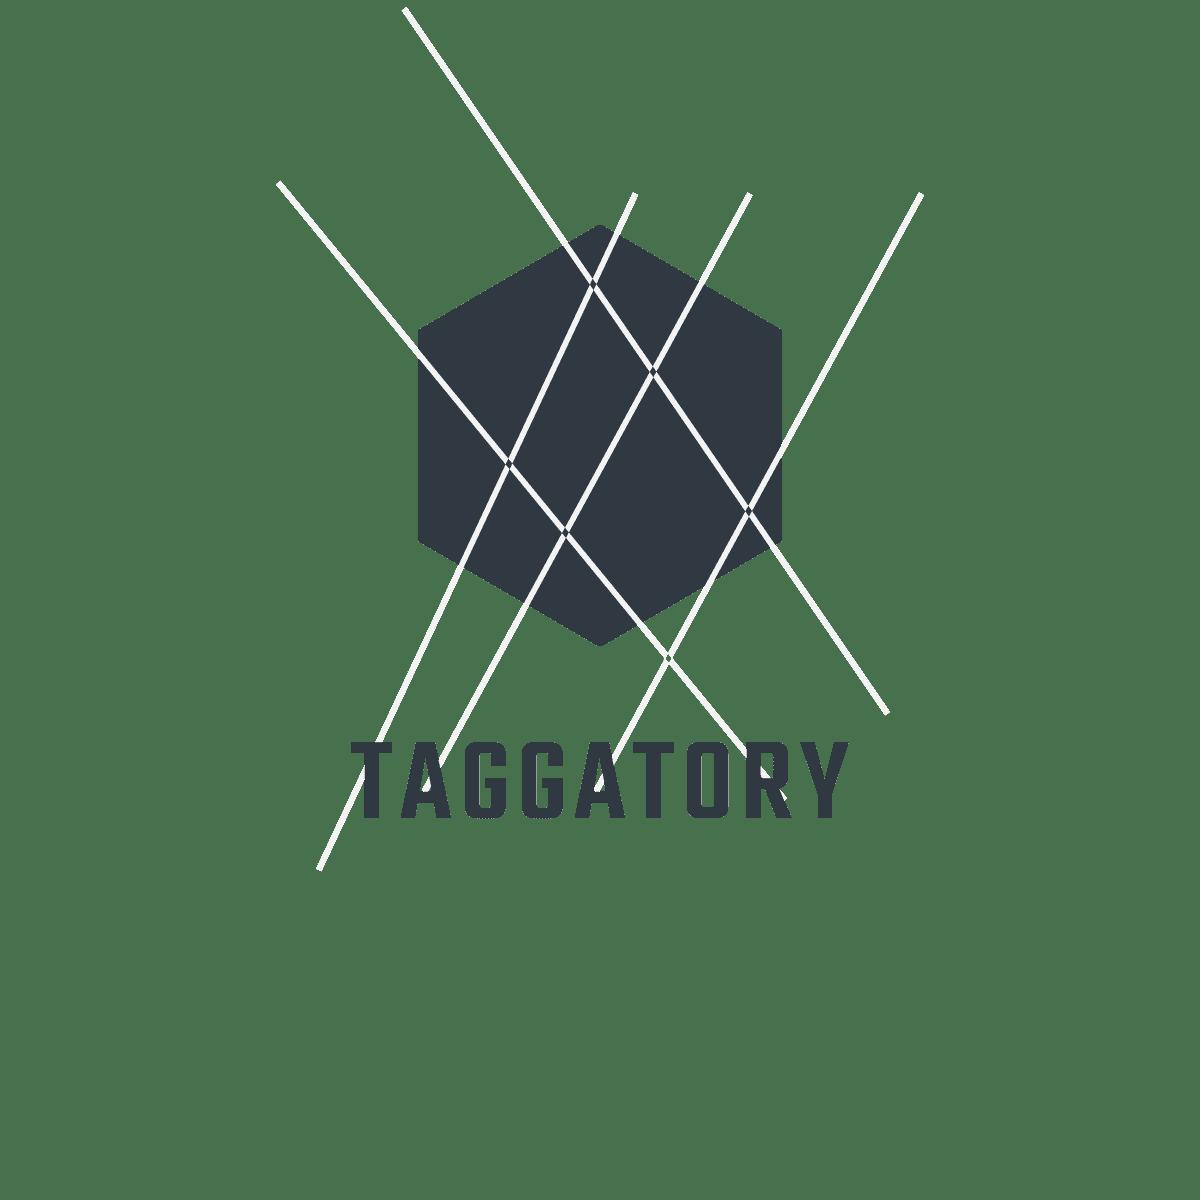 Taggatory logo - instagram hashtag analysis